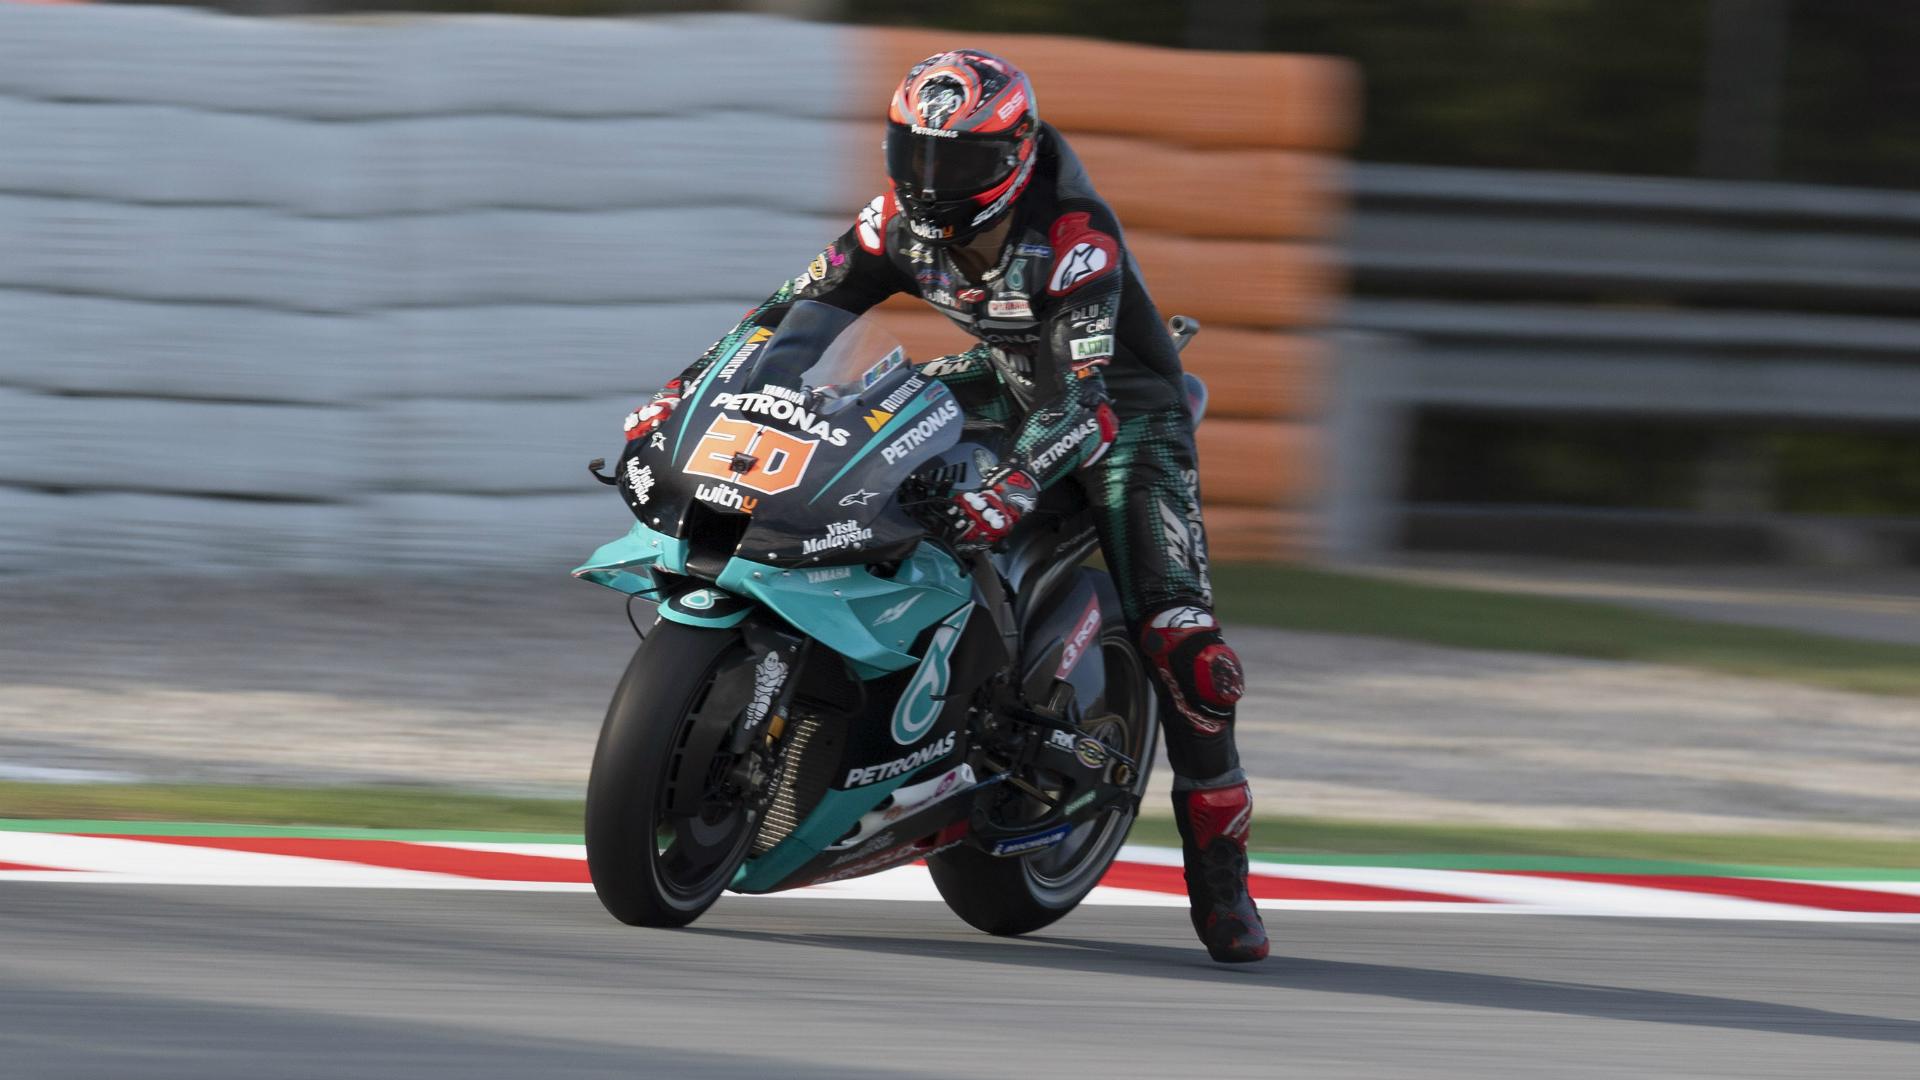 MotoGP 2020: Quartararo wins to regain championship lead as rivals stumble